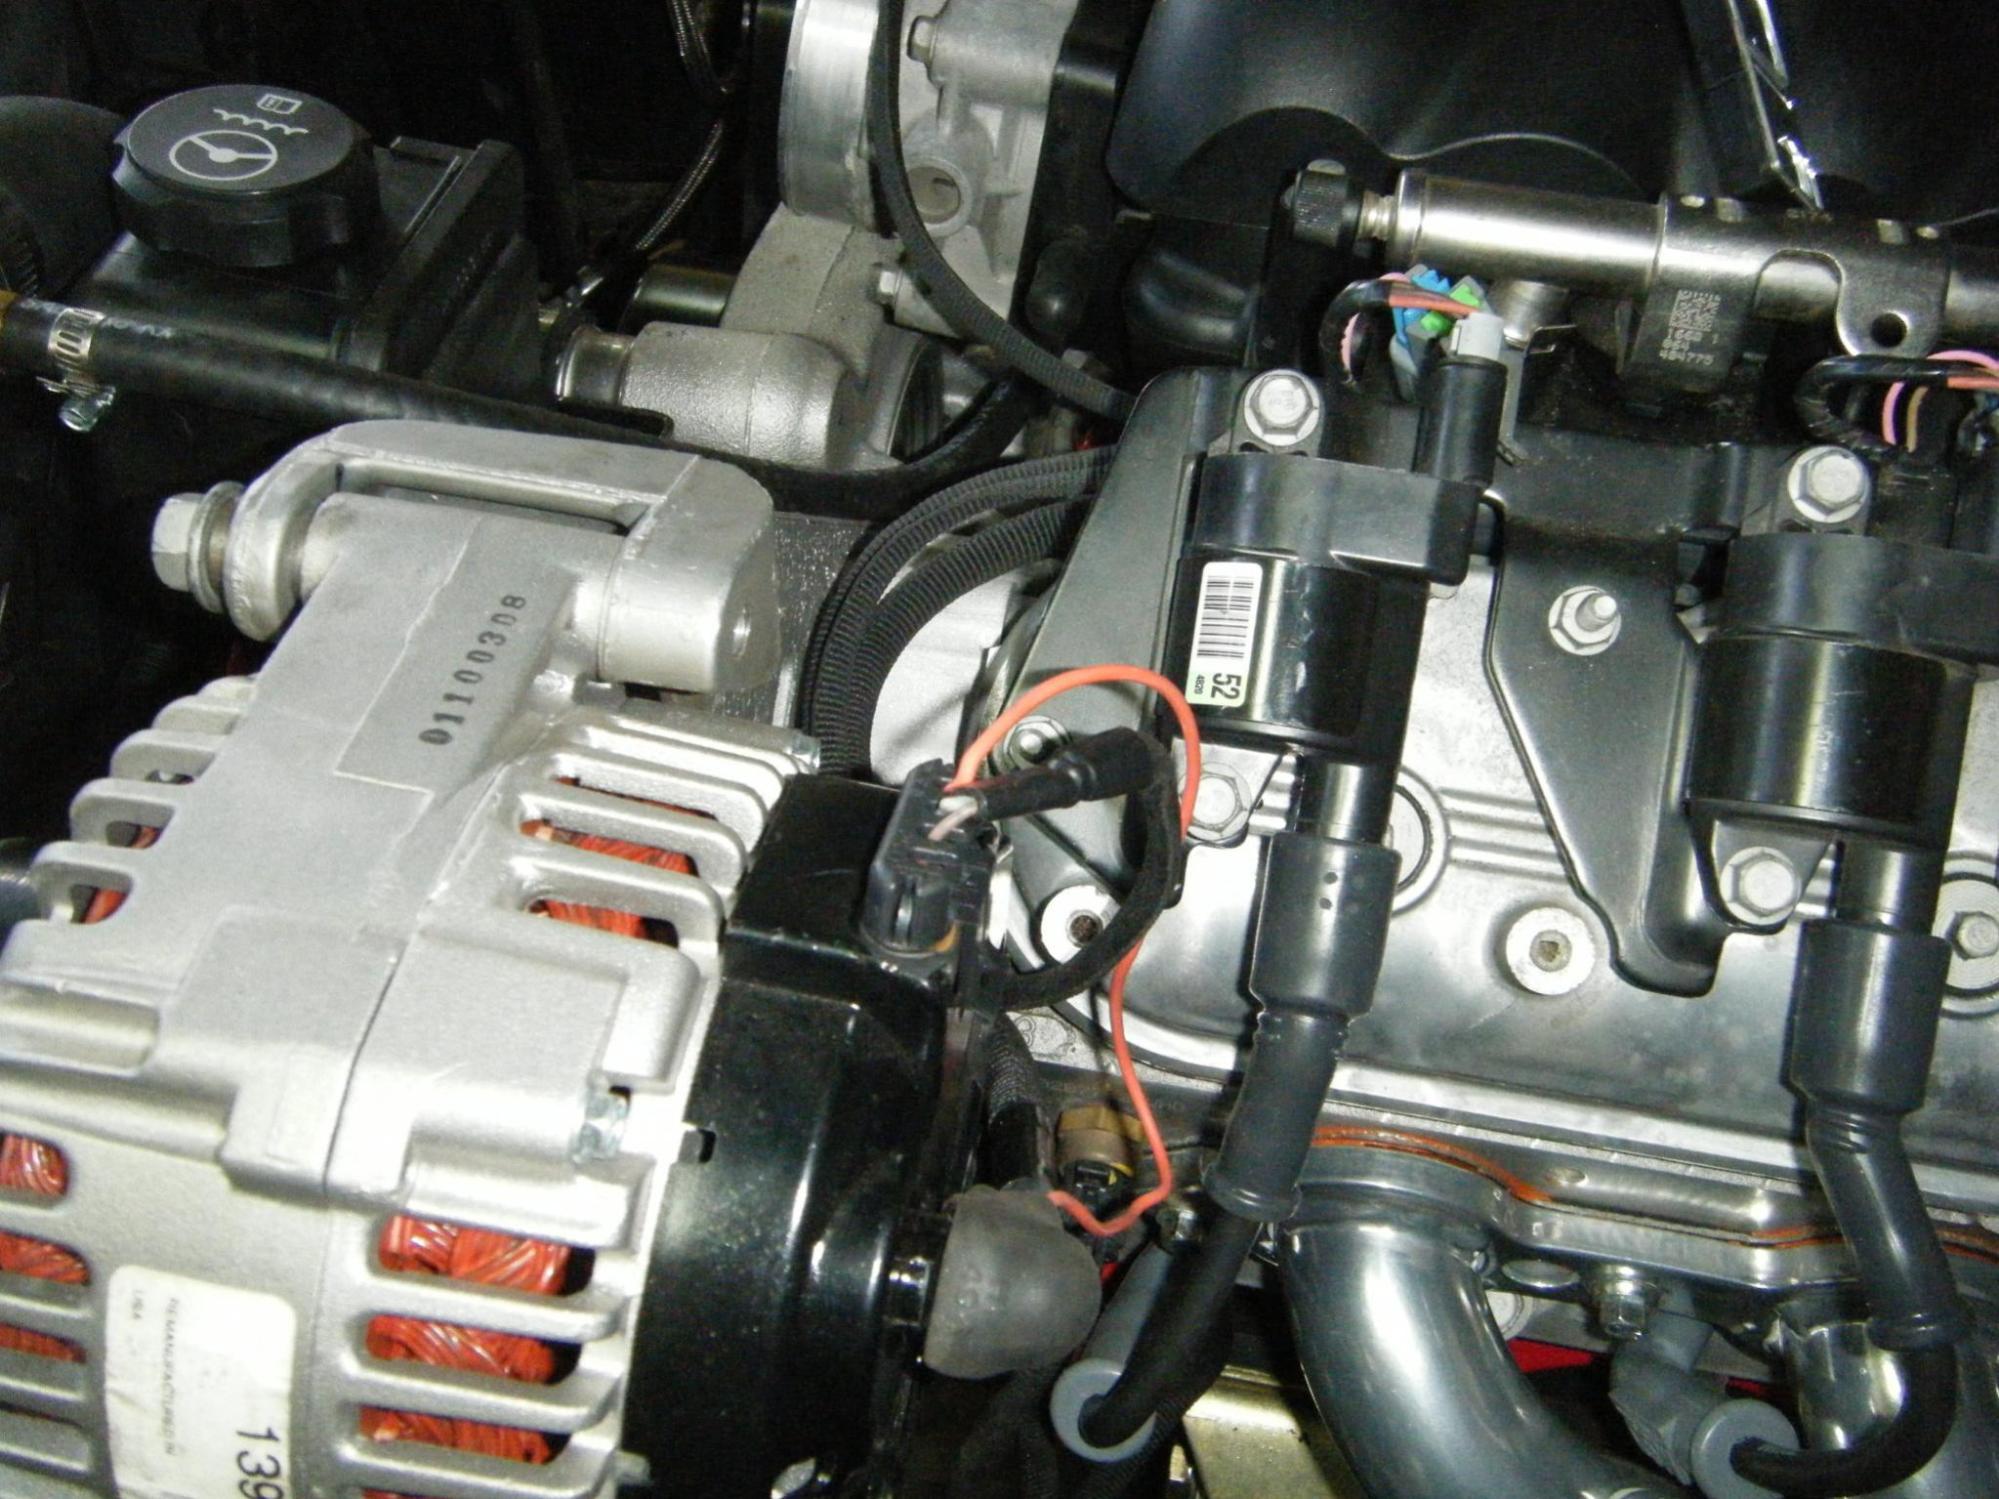 hight resolution of  ls wiring harness psi modern vintage or speartech dscf2145 jpg